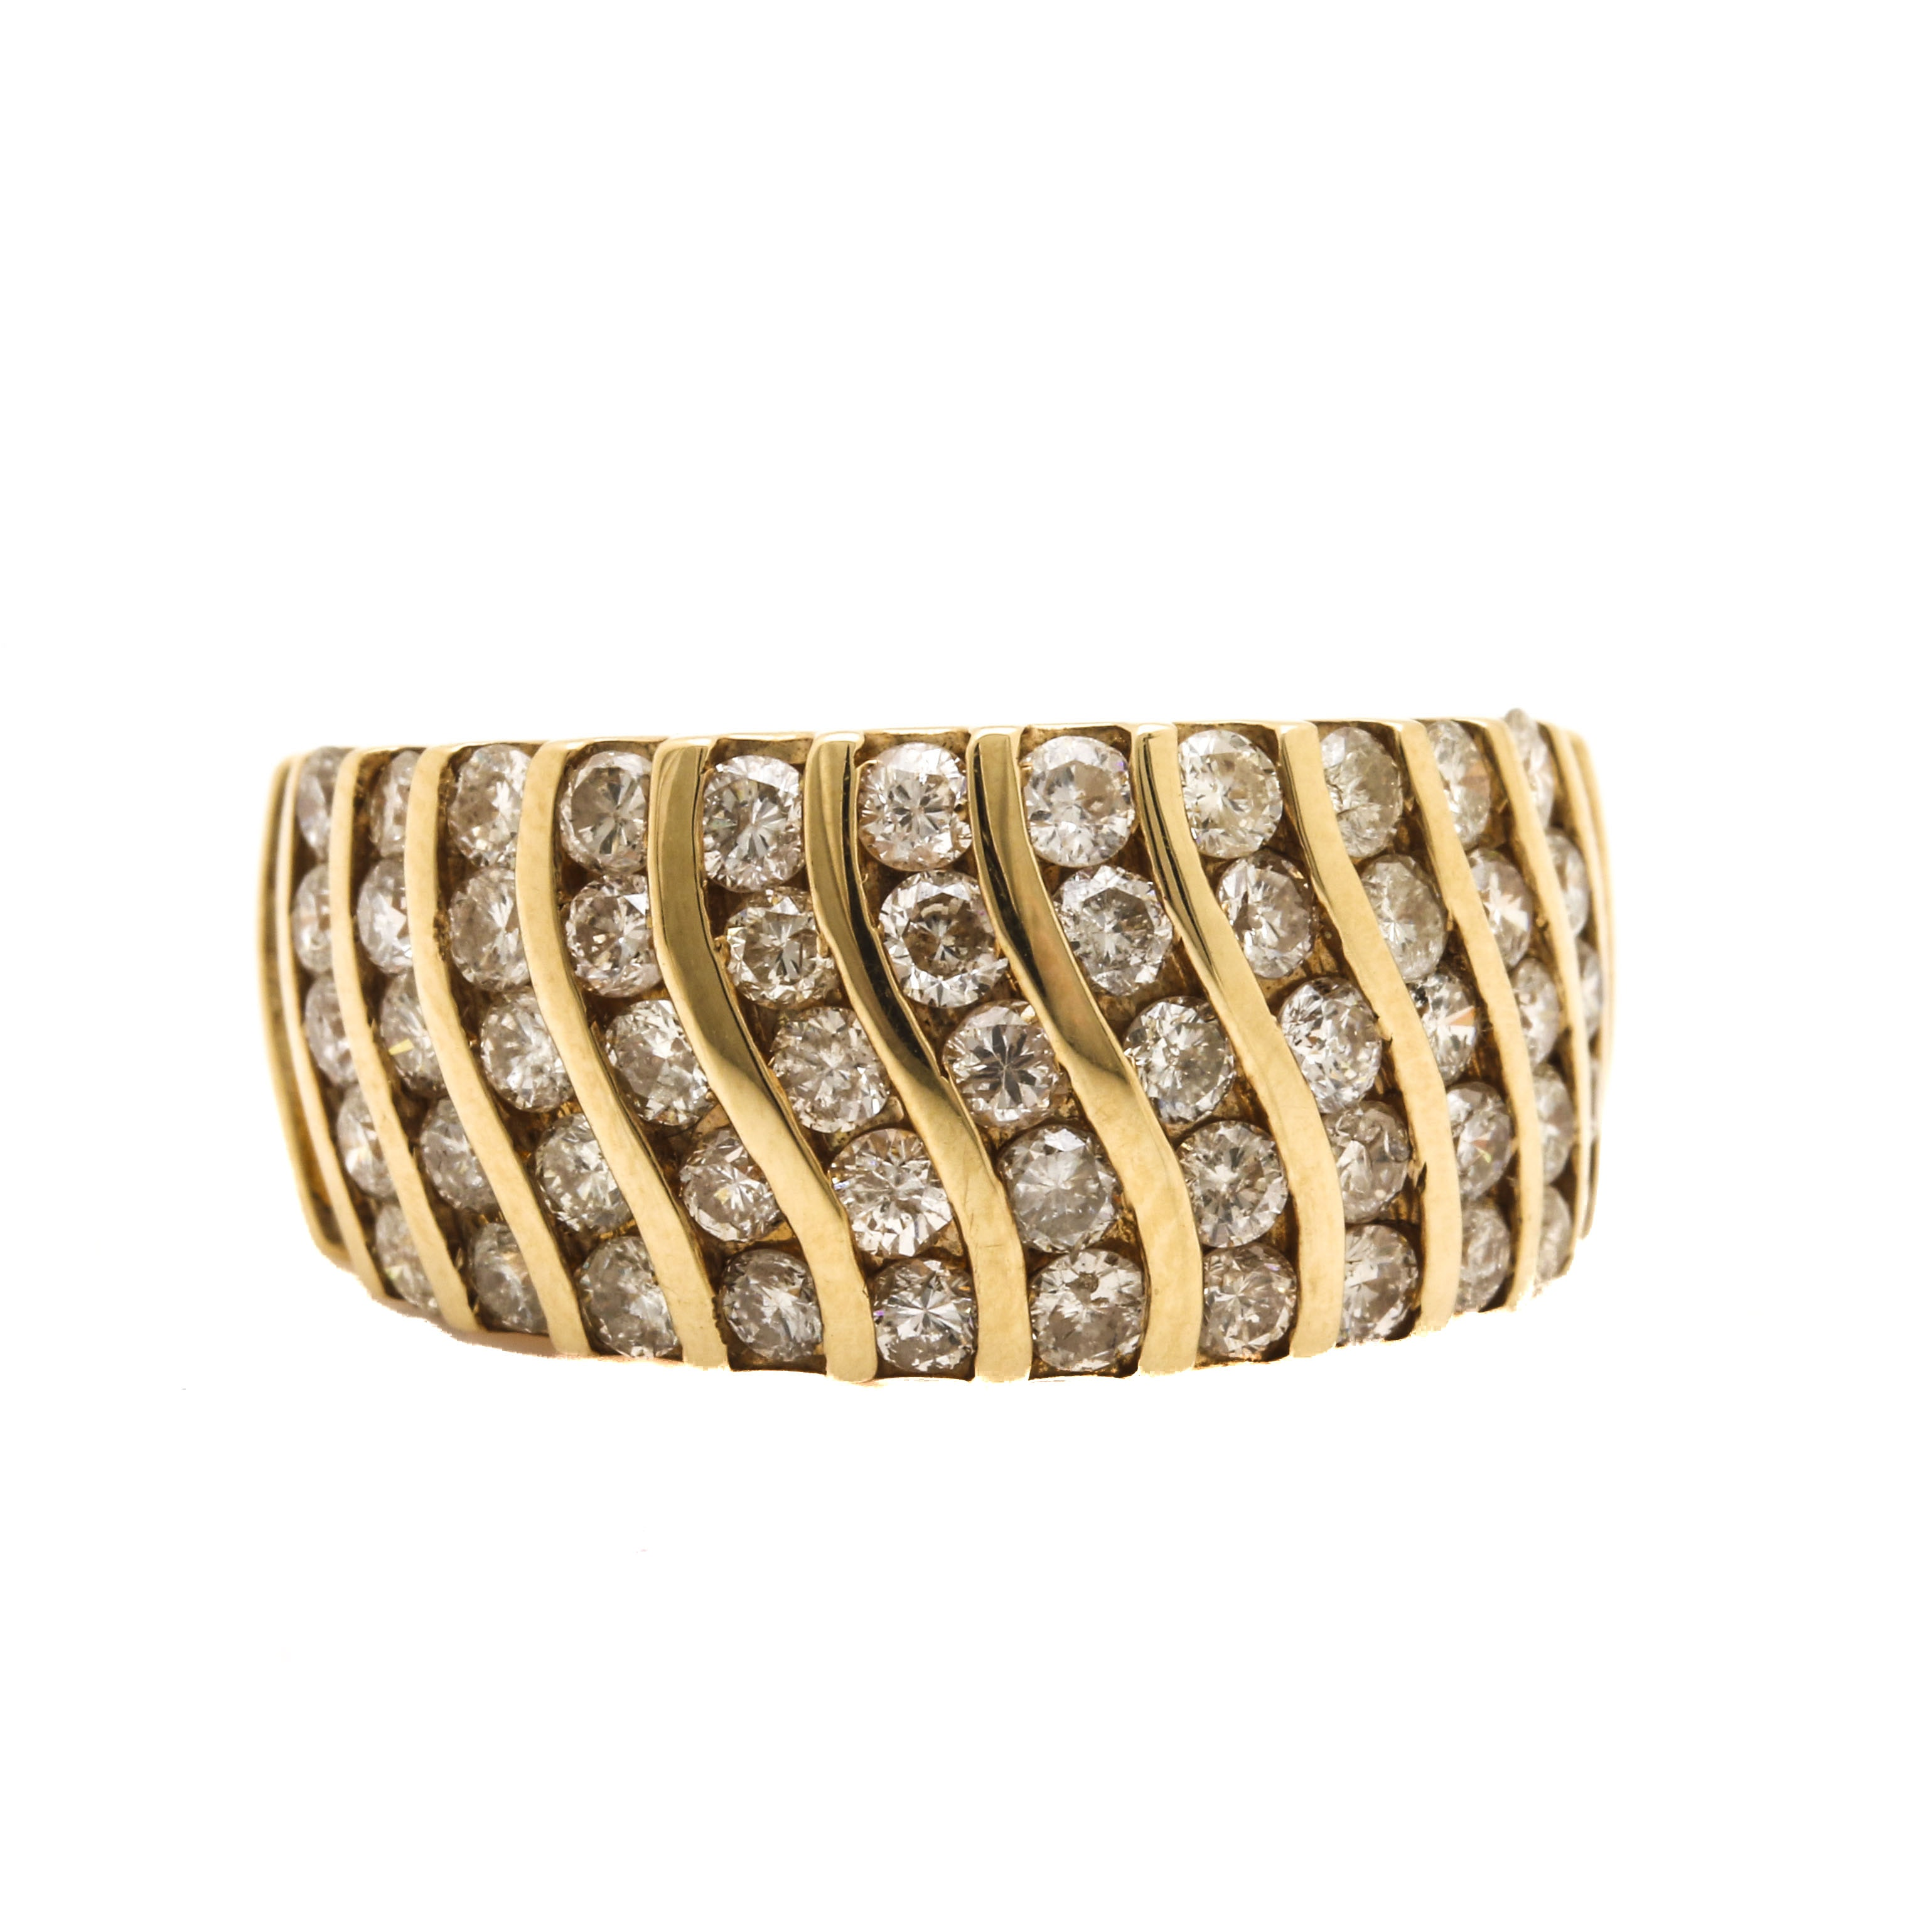 14K Yellow Gold 1.95 CTW Diamond Ring